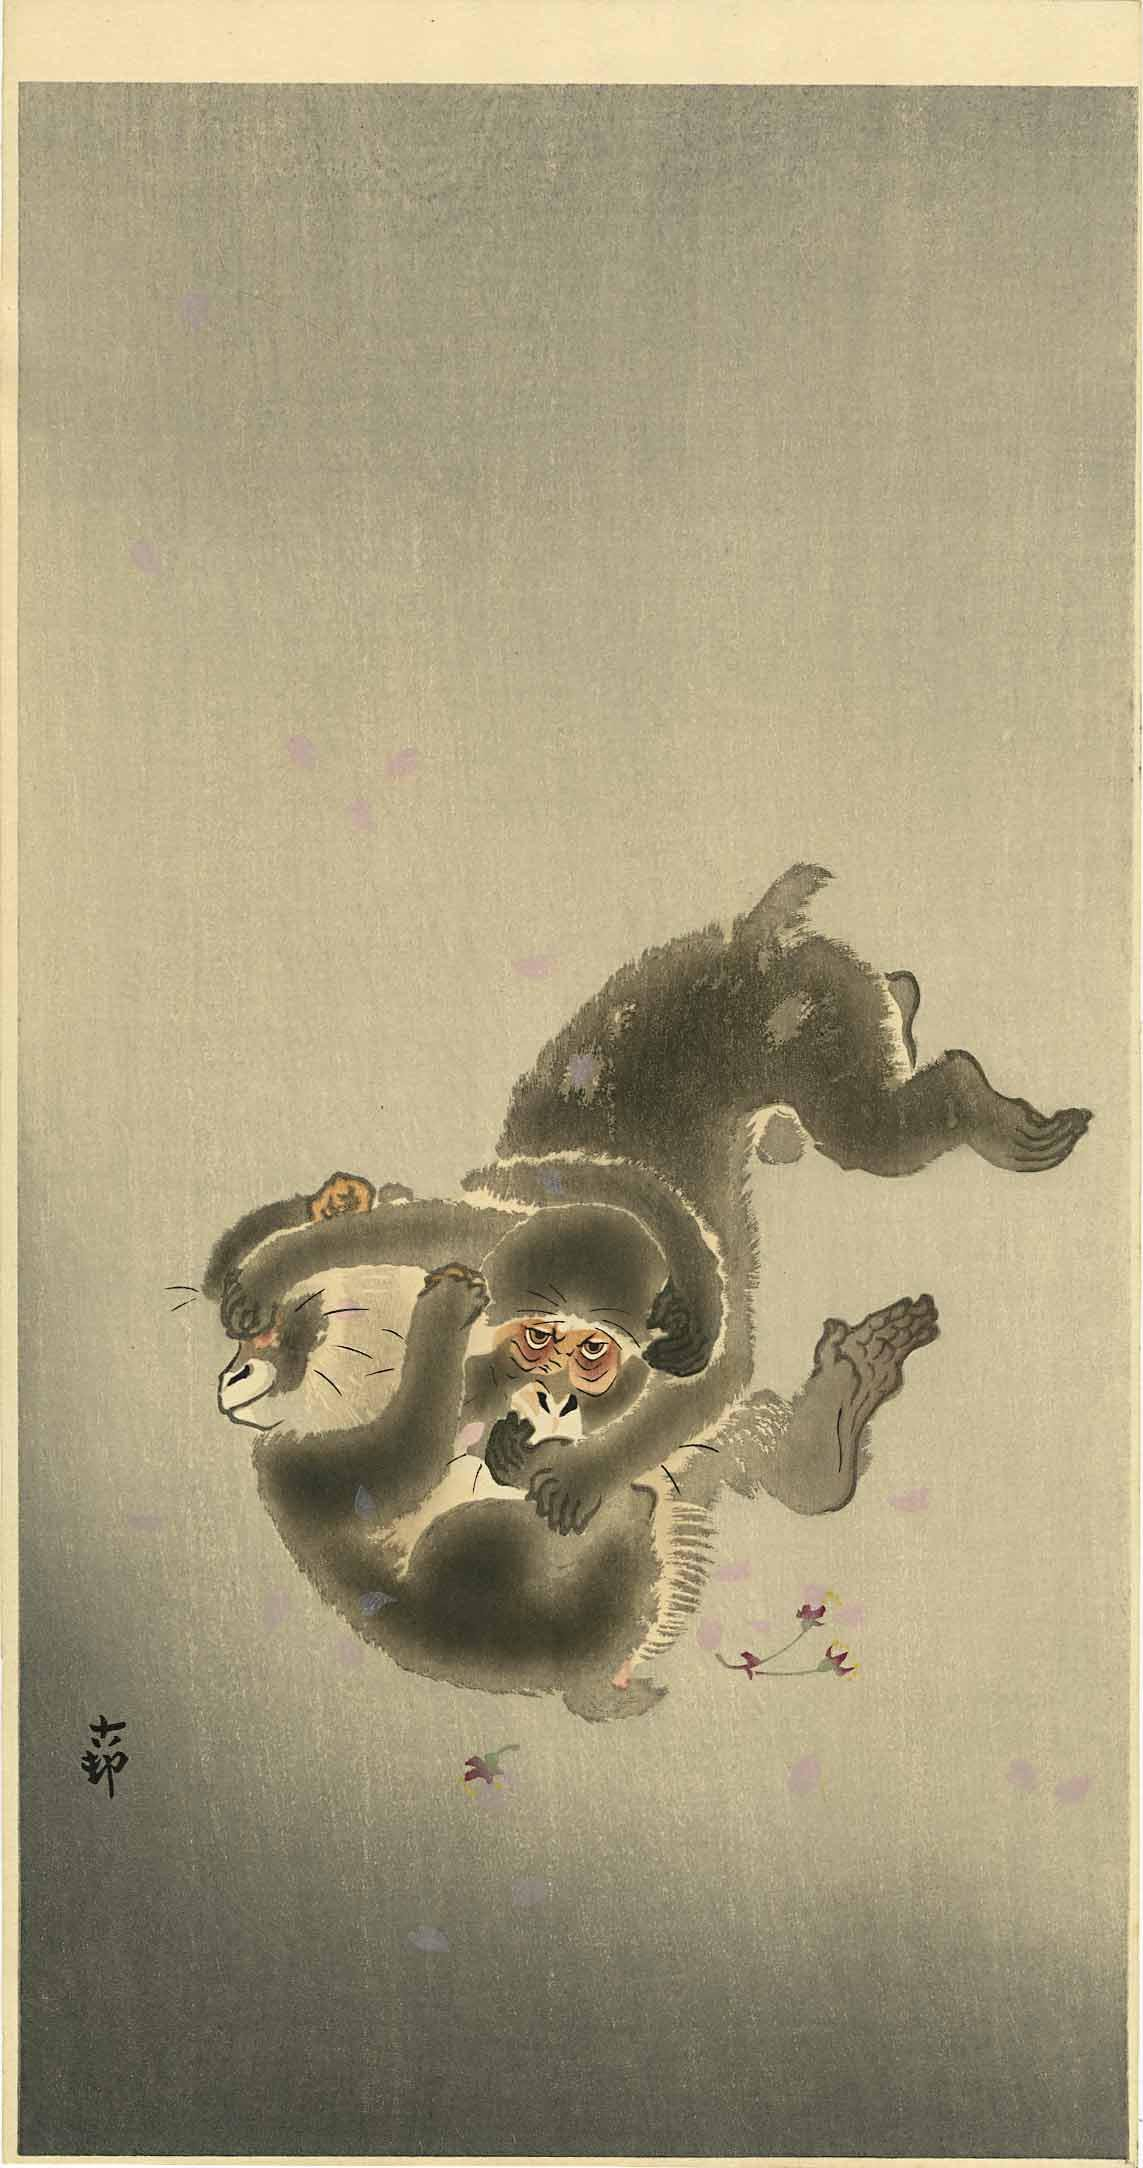 Koson Ohara: Monkeys Wrestling 1920s Woodblock